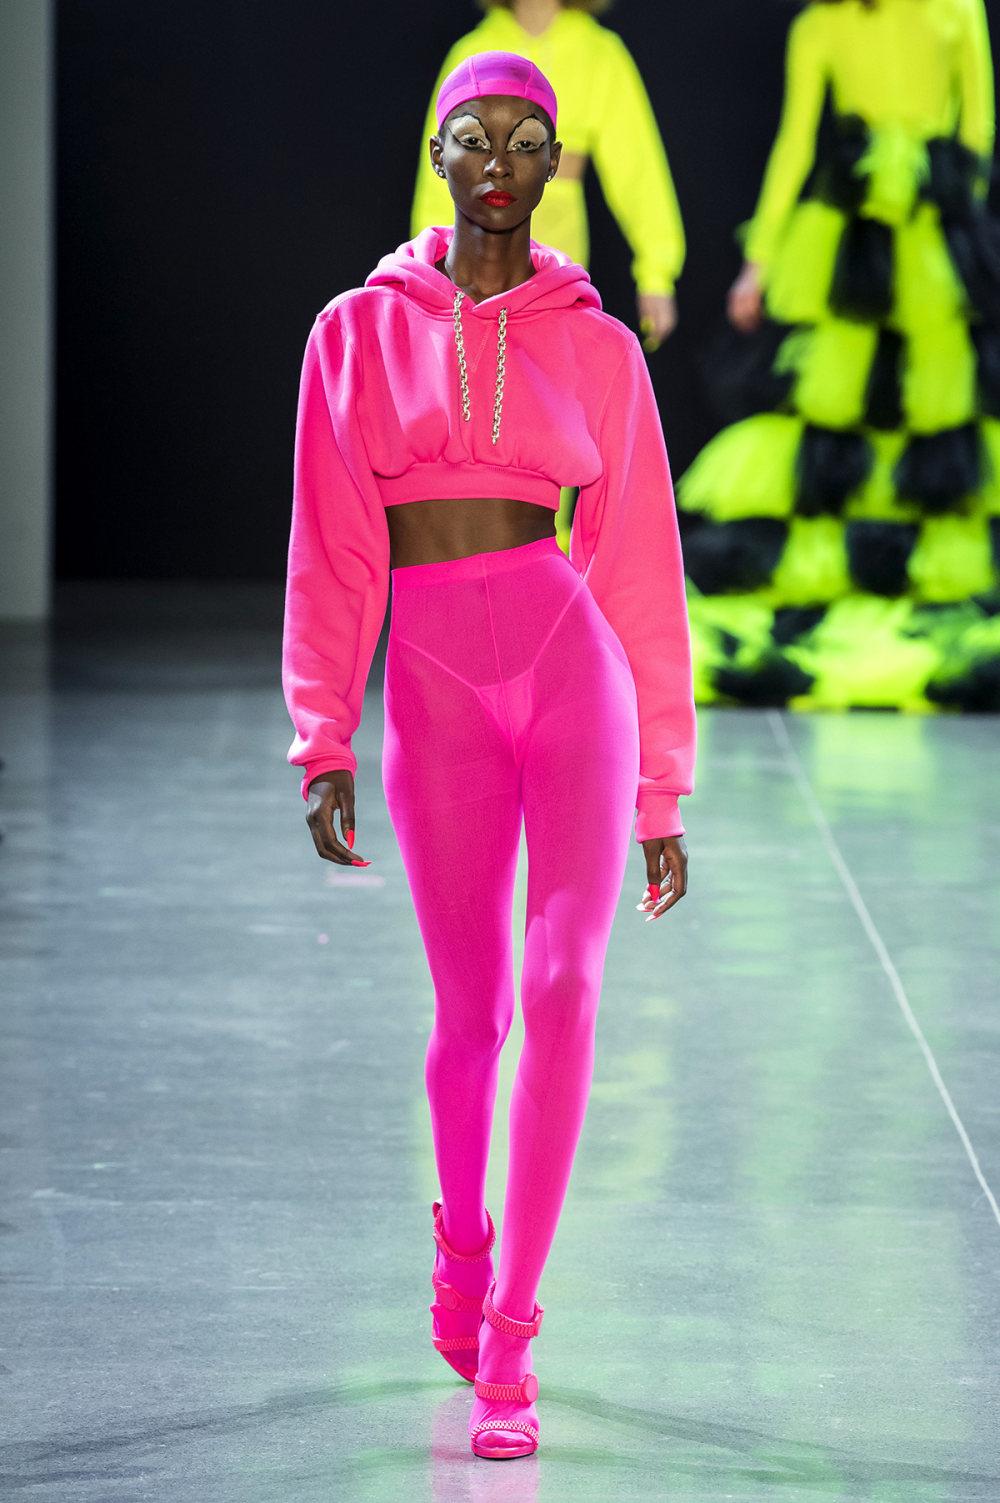 Christian Cowan时装系列虽然巨大的薄纱层状服装并没有那么特别-19.jpg